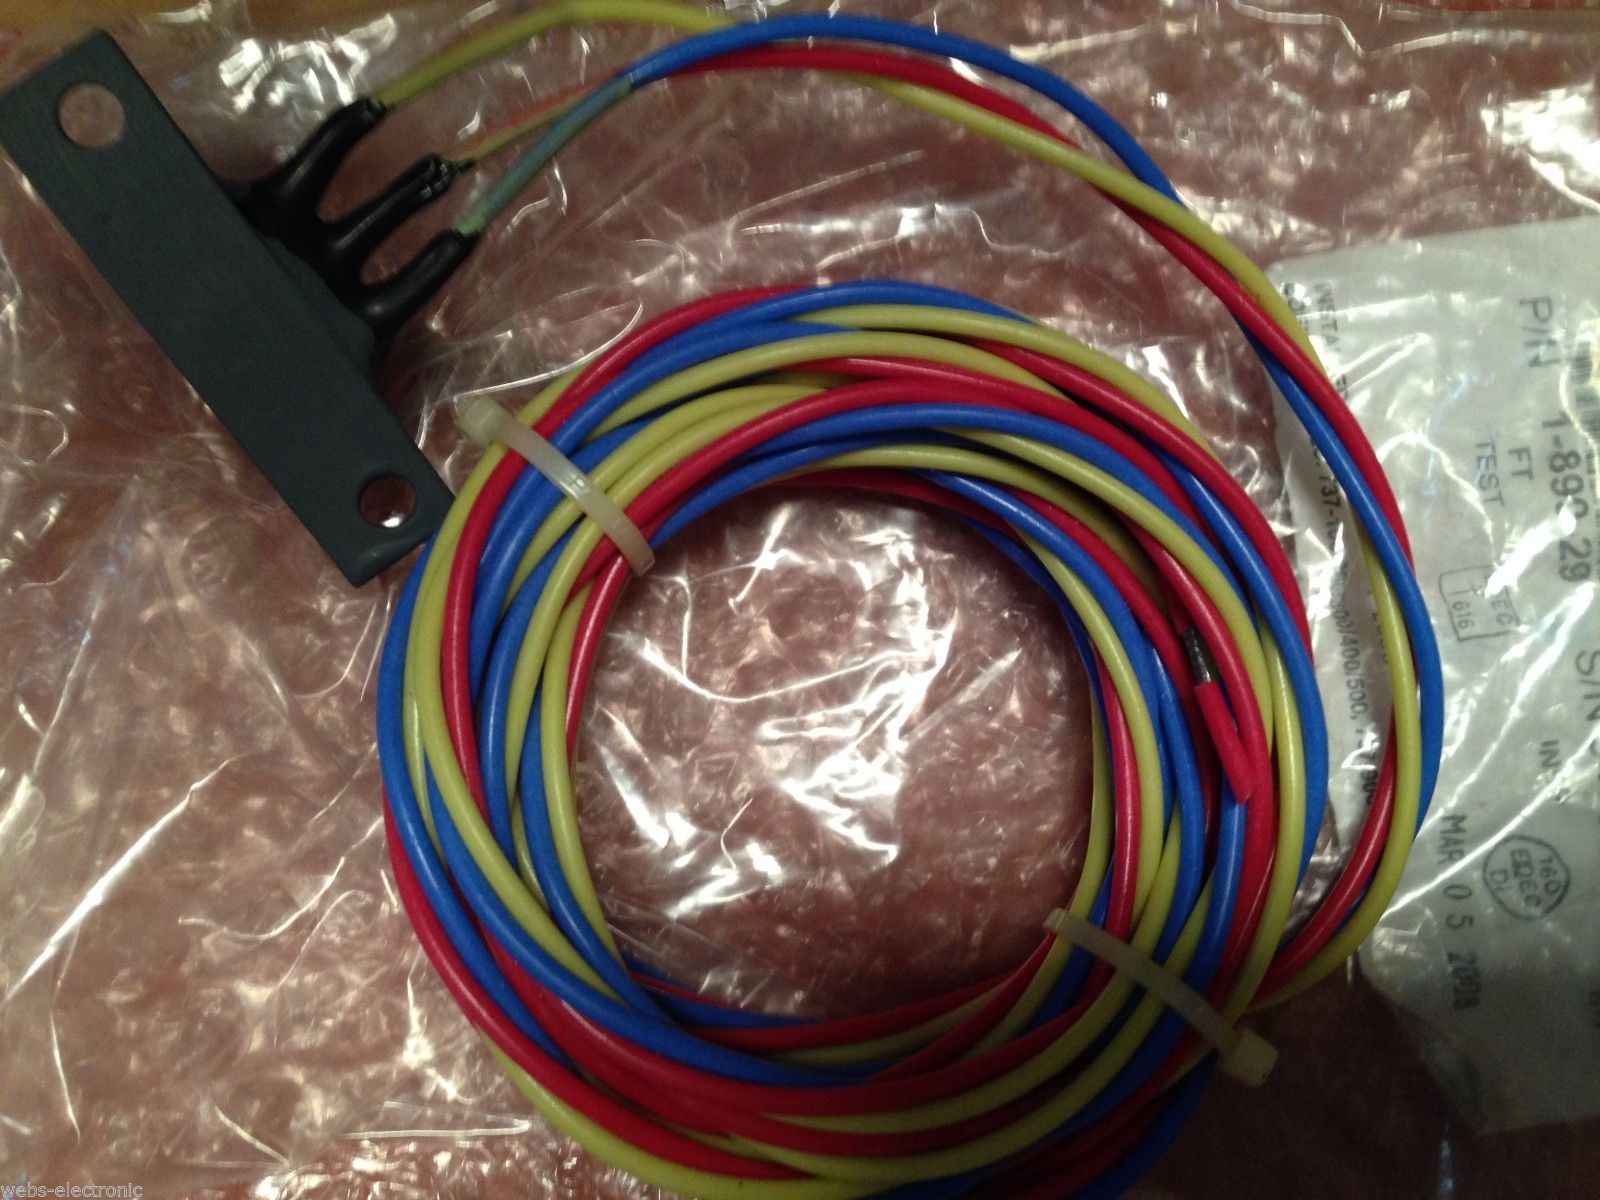 Eldec corporation sensor proximity switch, p/n 1-899-29 10-61226-29 cage 08748